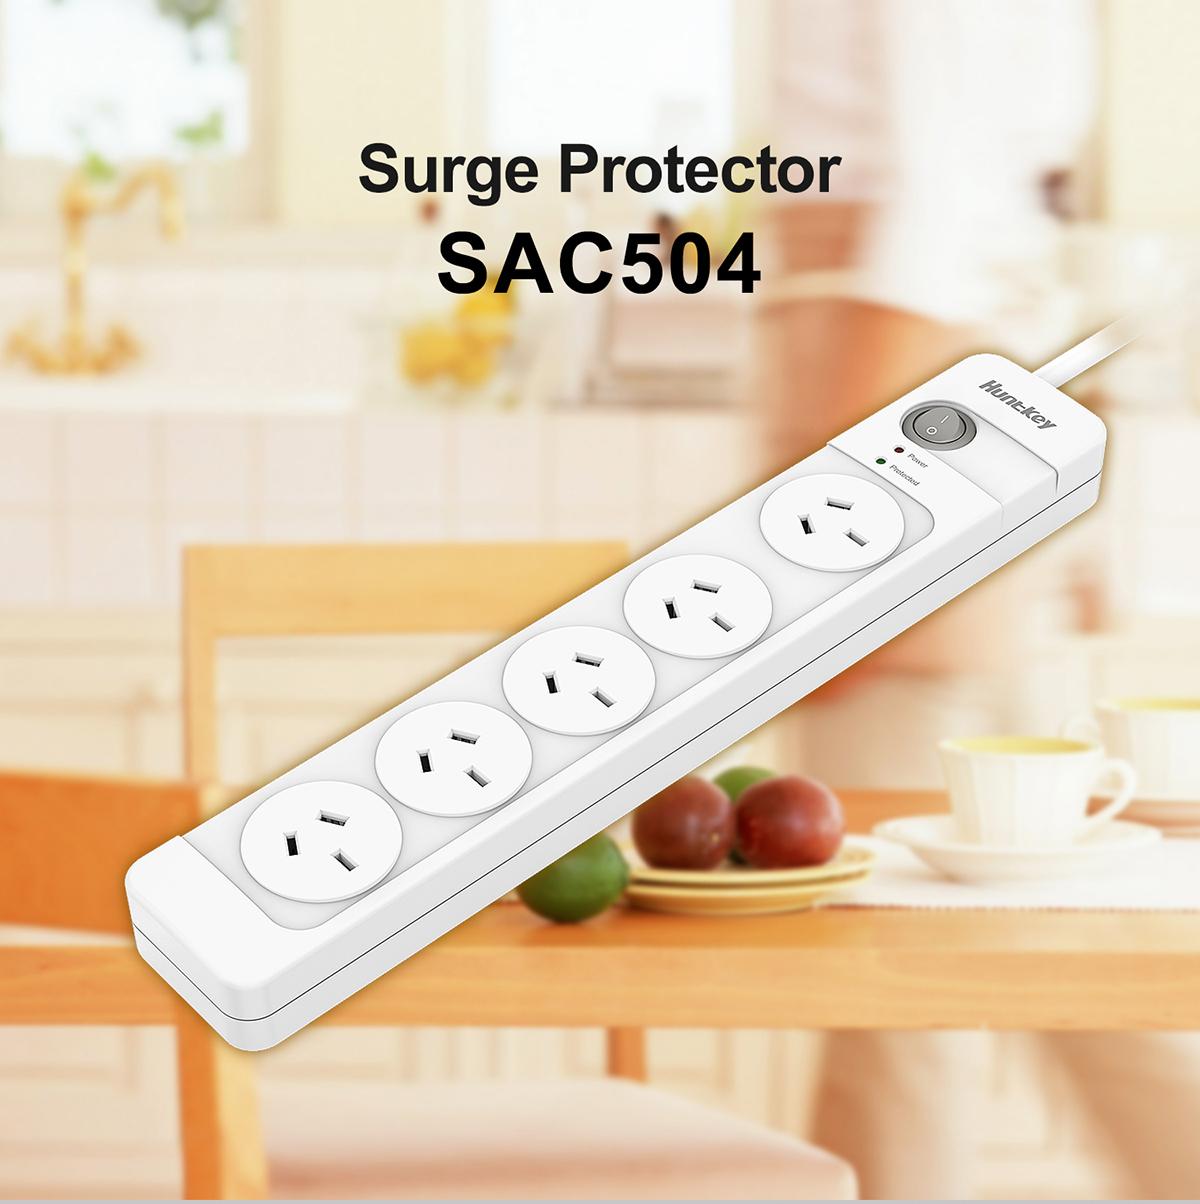 SAC504_01 SAC504